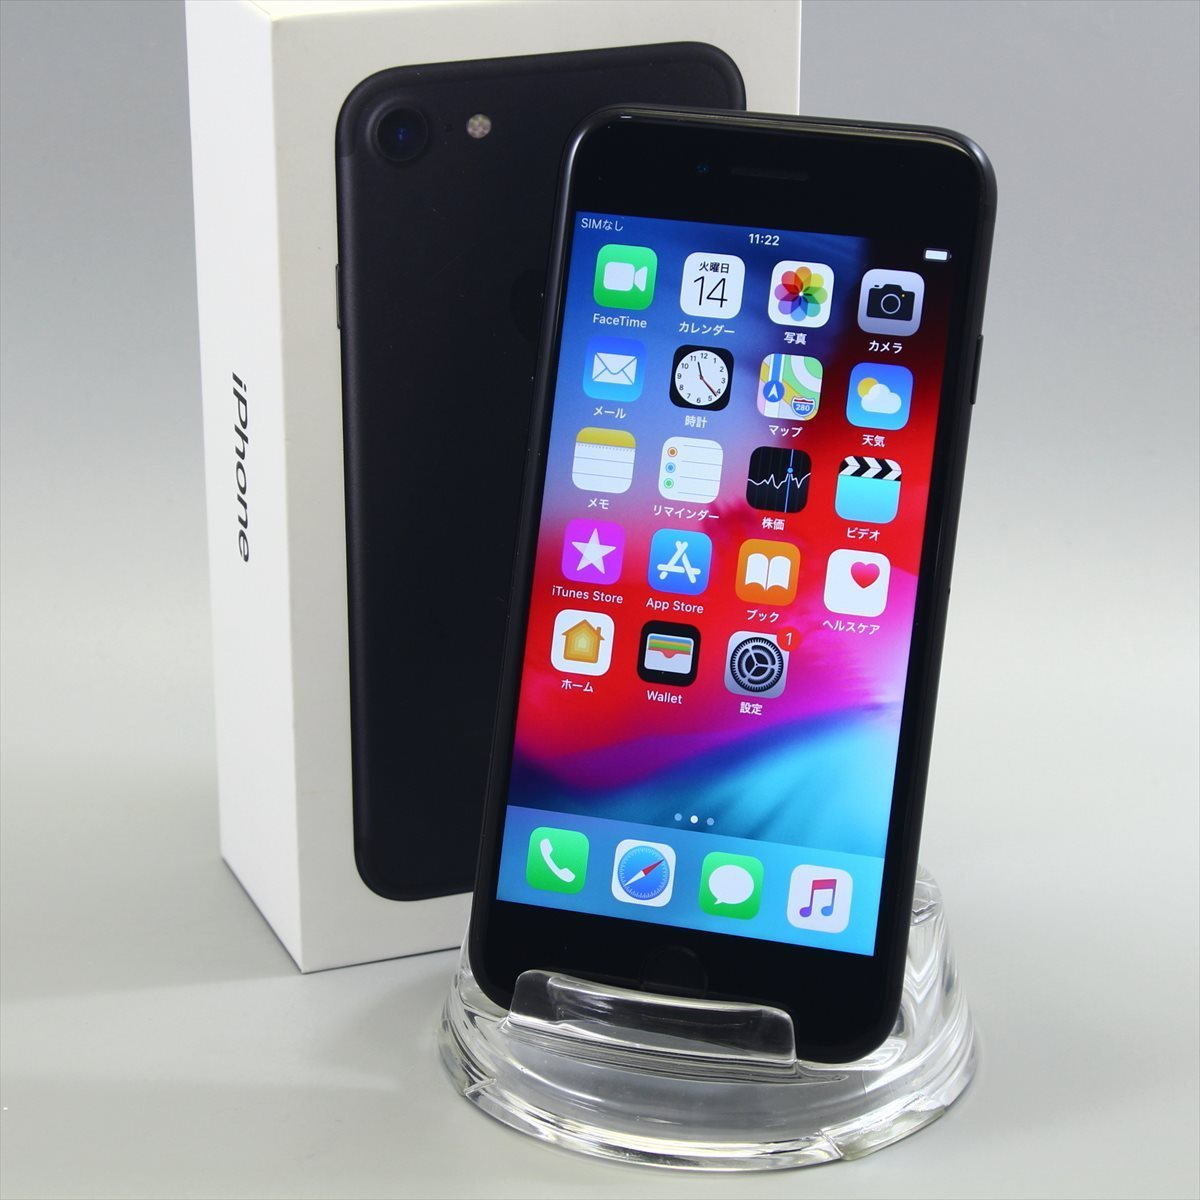 Apple iPhone7 32GB ブラック A1779 MNCE2J/A バッテリ83%■ソフトバンク★Joshin1632【送料無料・1円】